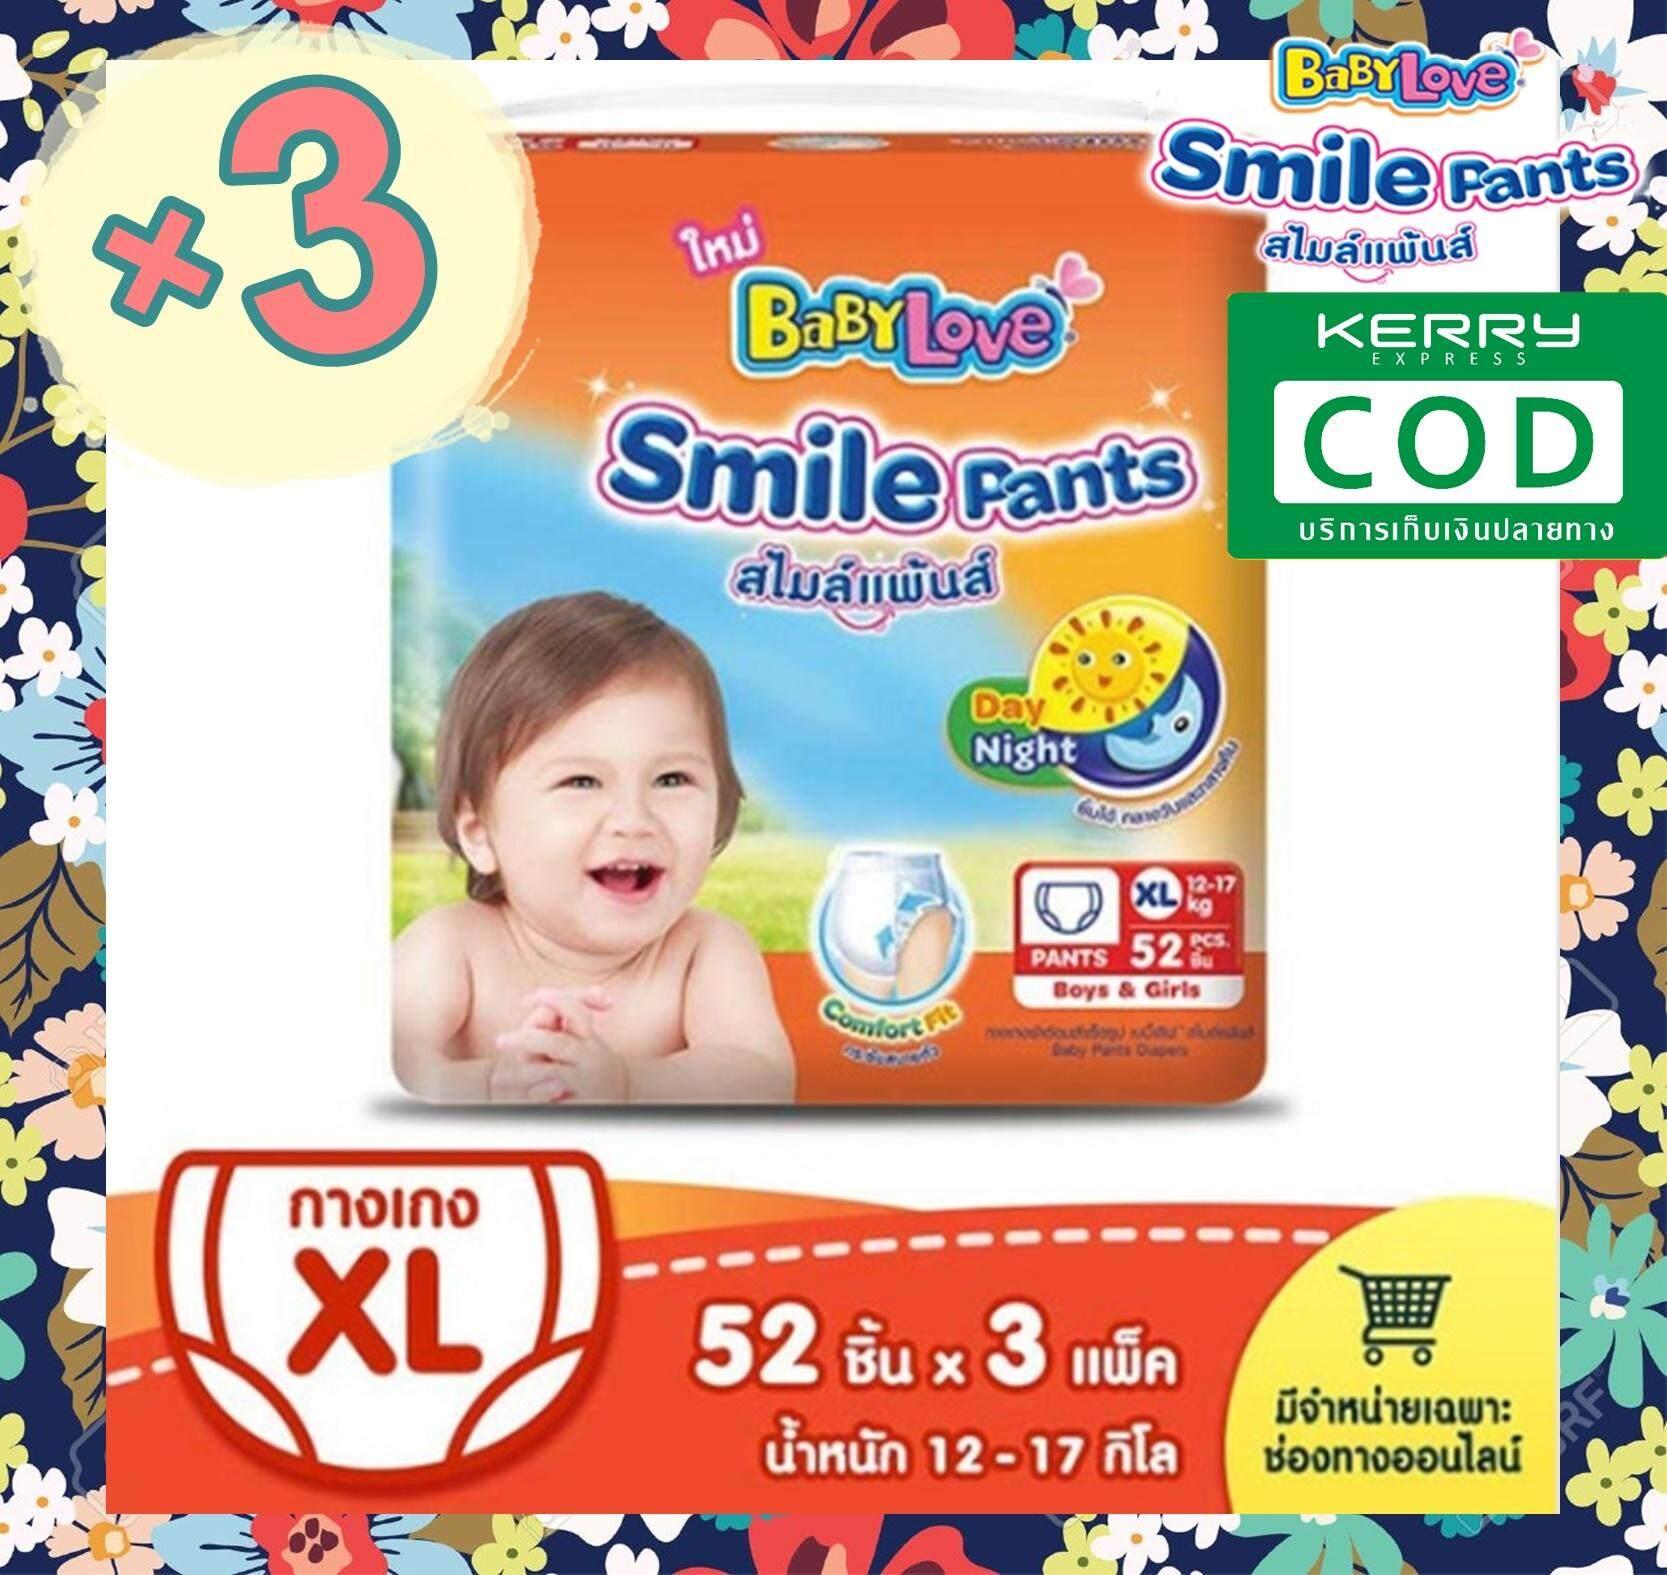 BabyLove Smile Pants ผ้าอ้อมเบบี้เลิฟ ราคาถูก (ยกลังมี 3 แพ็ค 156 ชิ้น) ไซส์ XL